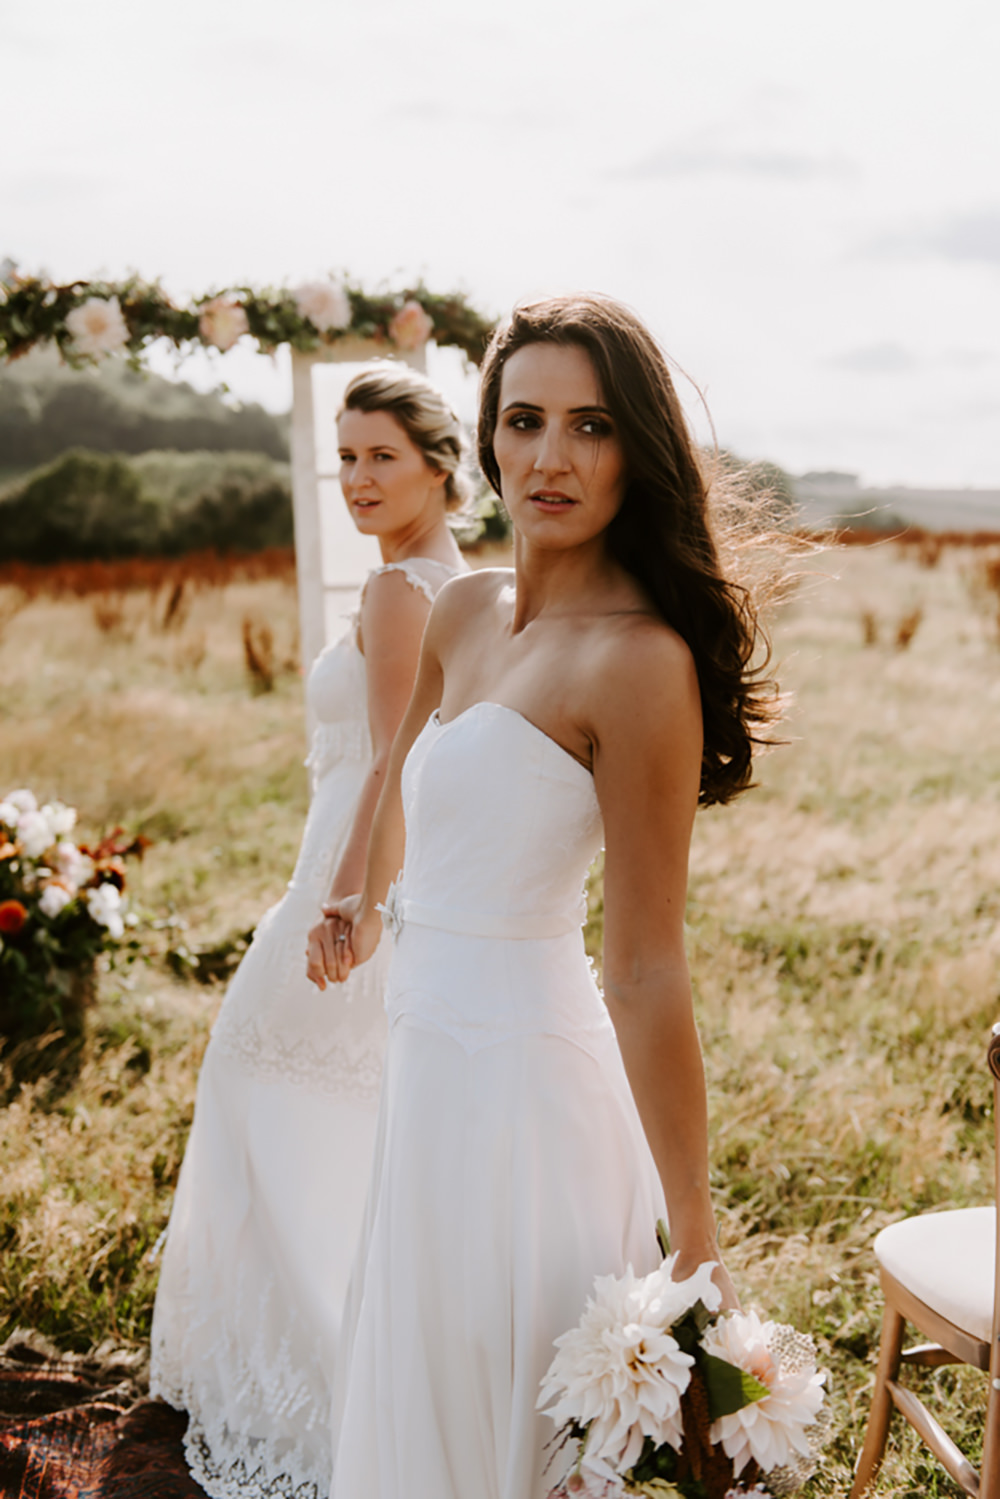 Bride Bridal Strapless Dress Gown Ethical Wedding Ideas Sadie Osborne Photography